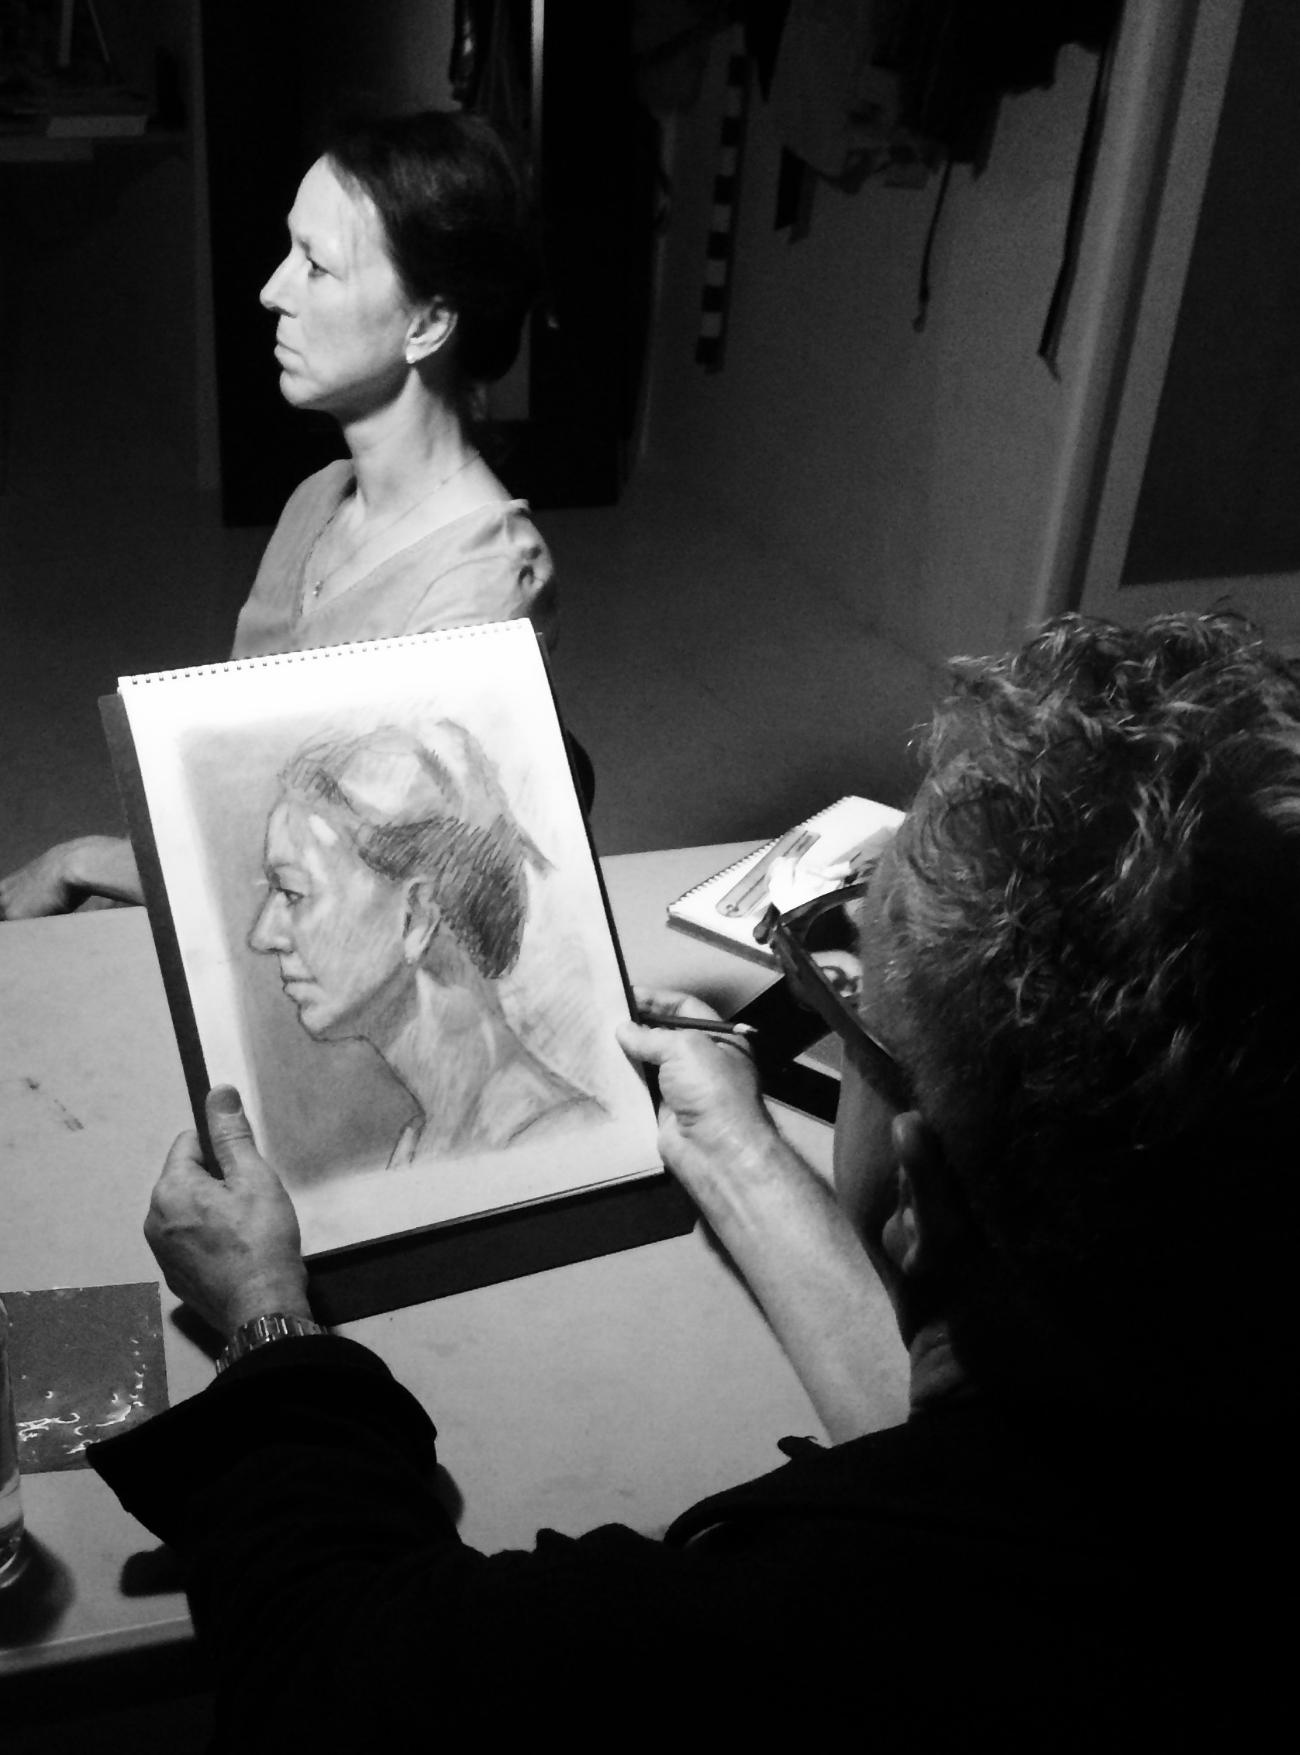 DRSB Workshop Instructor Brian Bomeisler--demonstration portrait drawing of a student